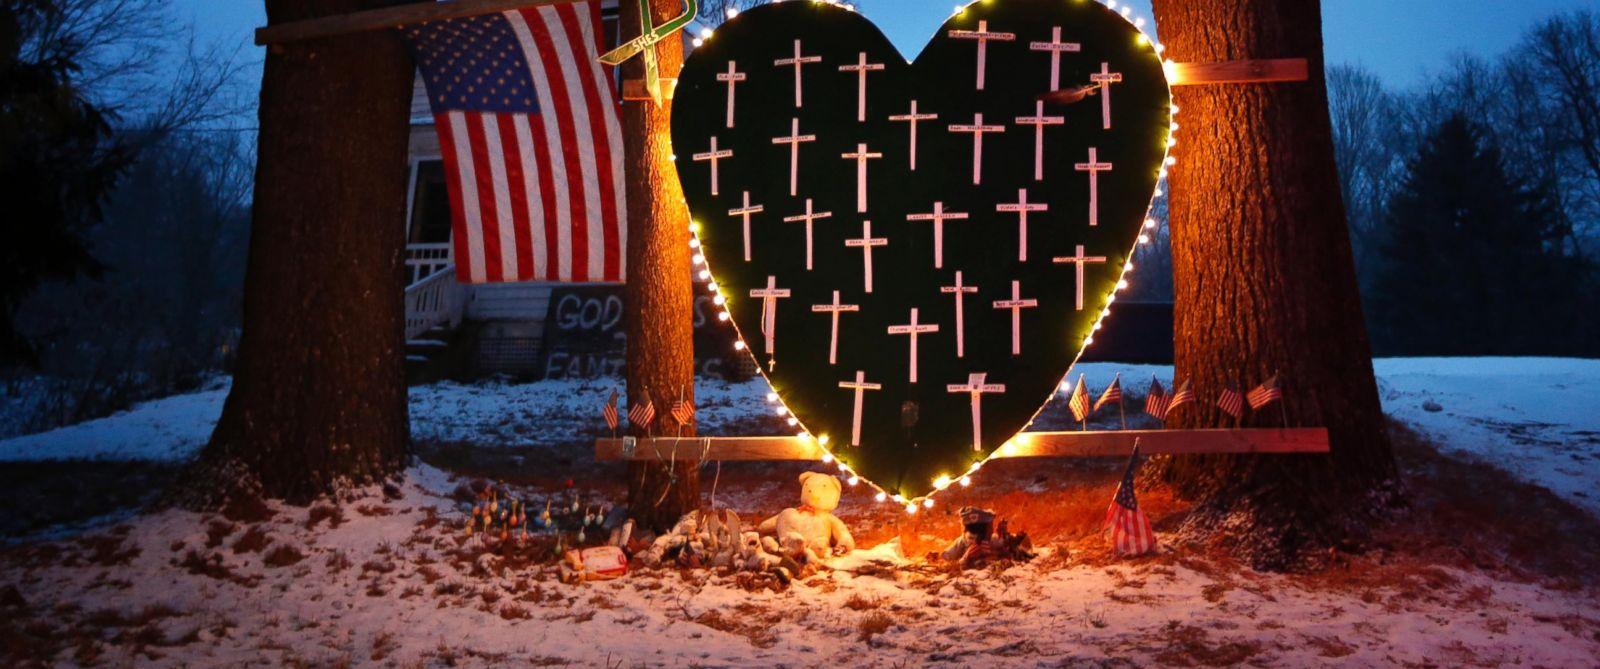 ap_newtown_memorial_ll_141211_12x5_1600